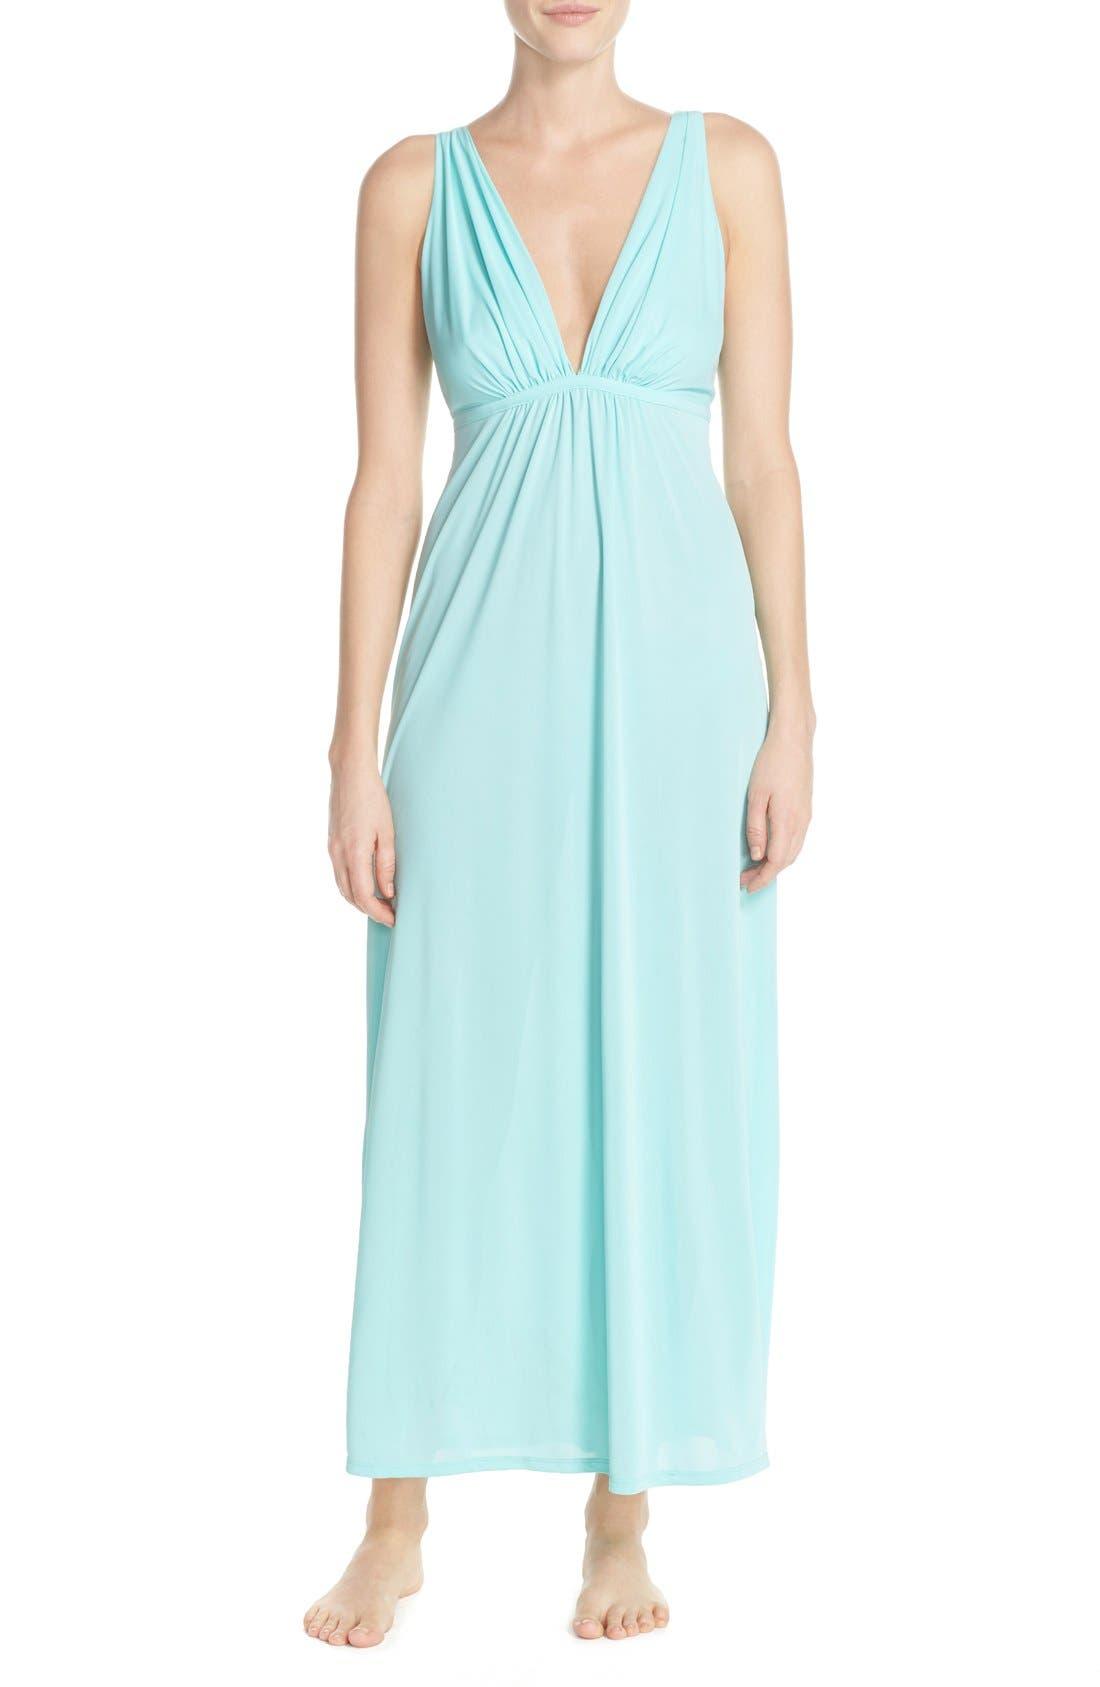 Alternate Image 1 Selected - Natori 'Aphrodite' Gown